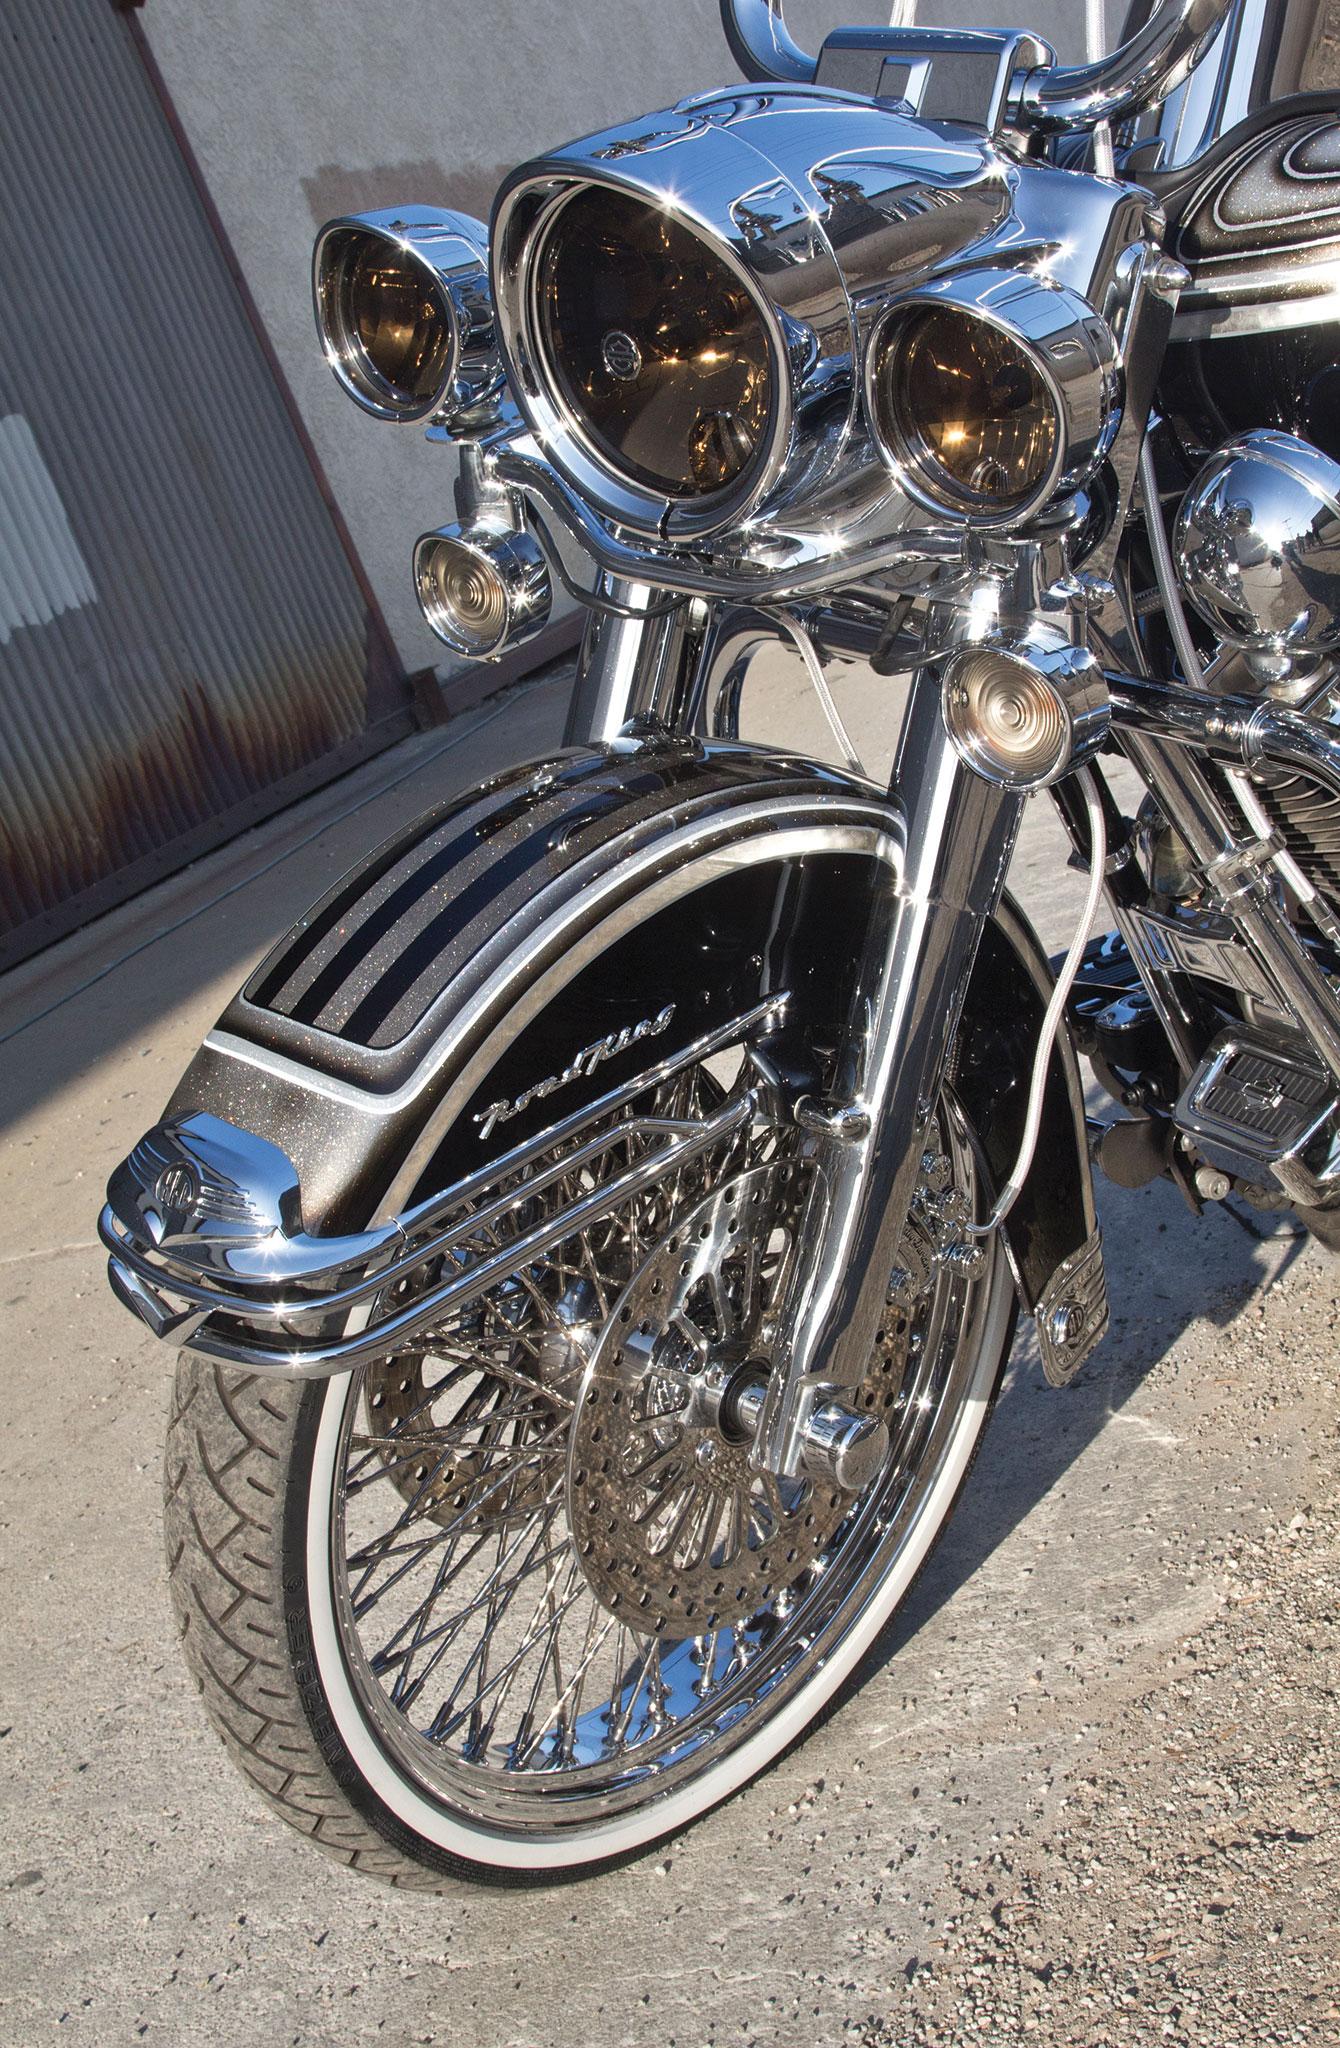 Hand Controls For Cars >> 2006 Harley Davidson Road King - History Repeating